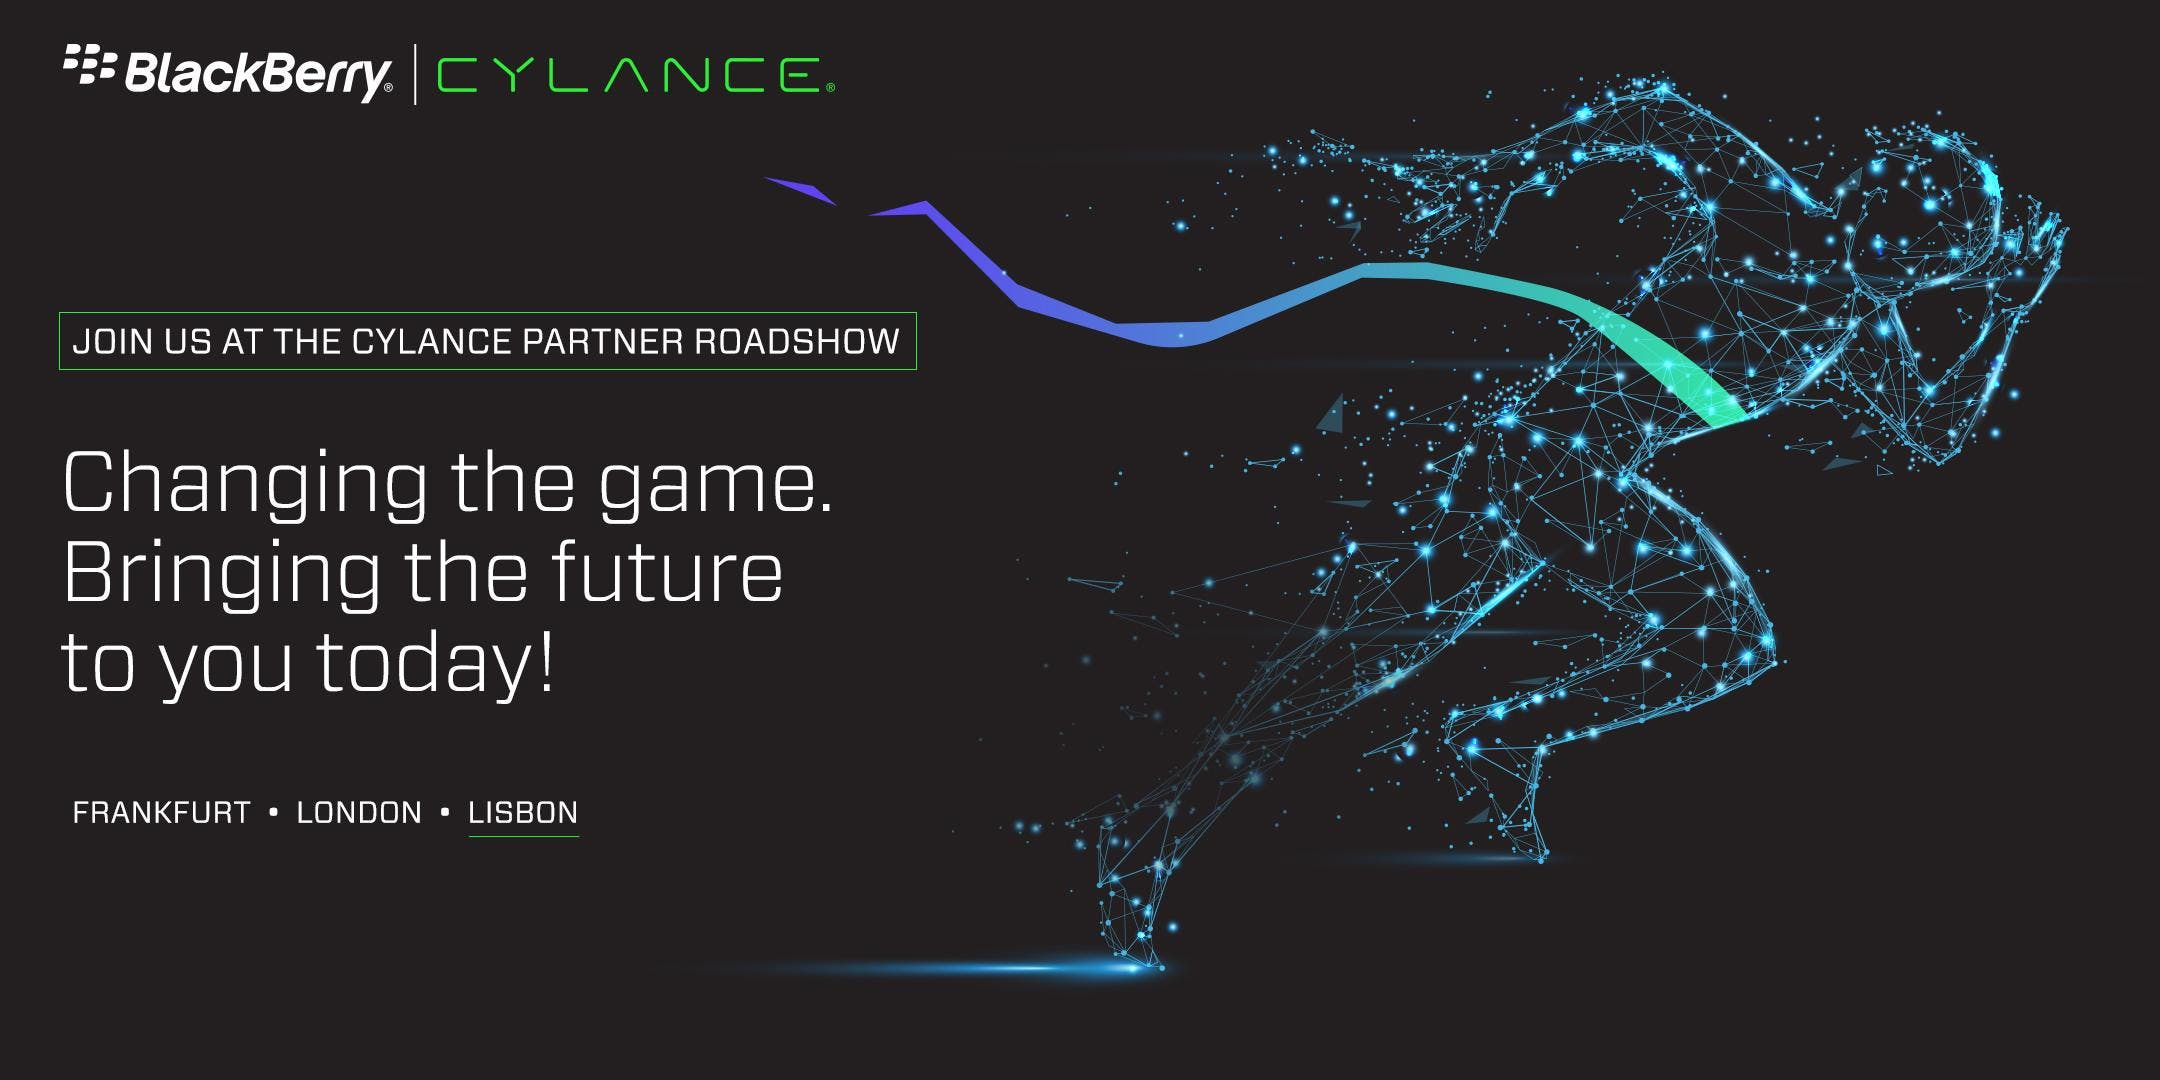 Blackberry Cylance Partner Roadshow Lisbon